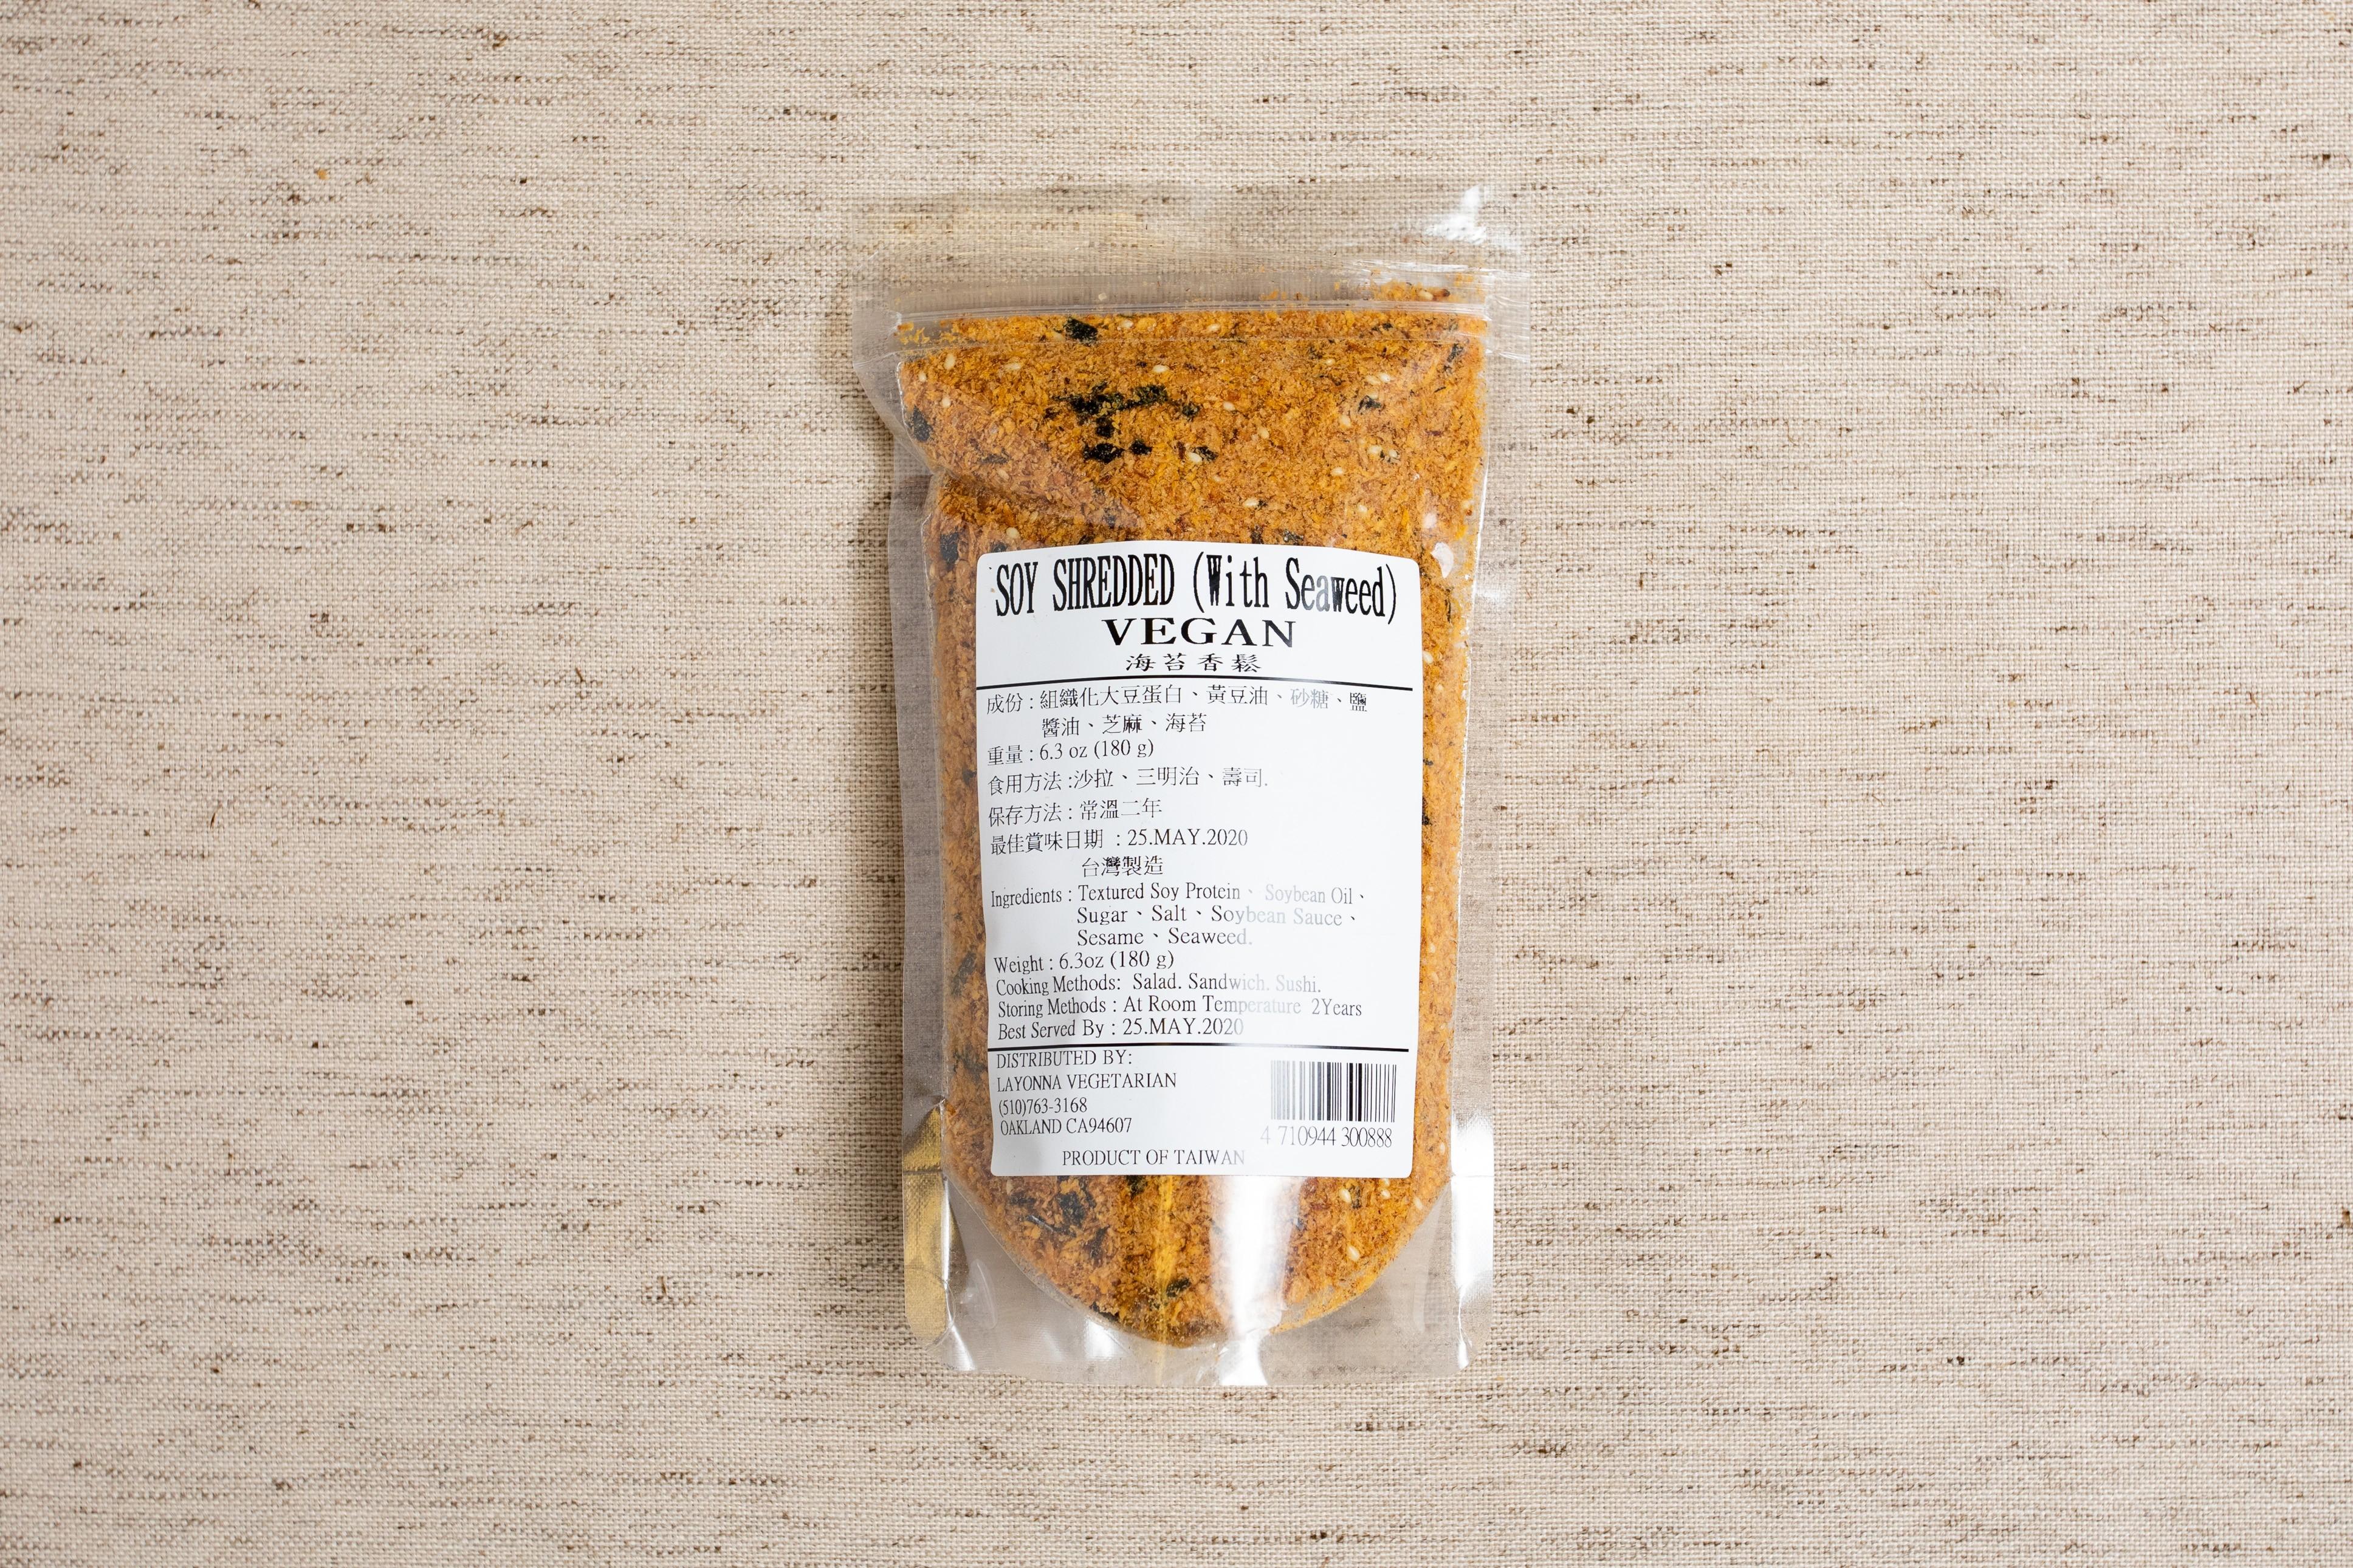 Snacks-Soy Shredded (with Seaweed)